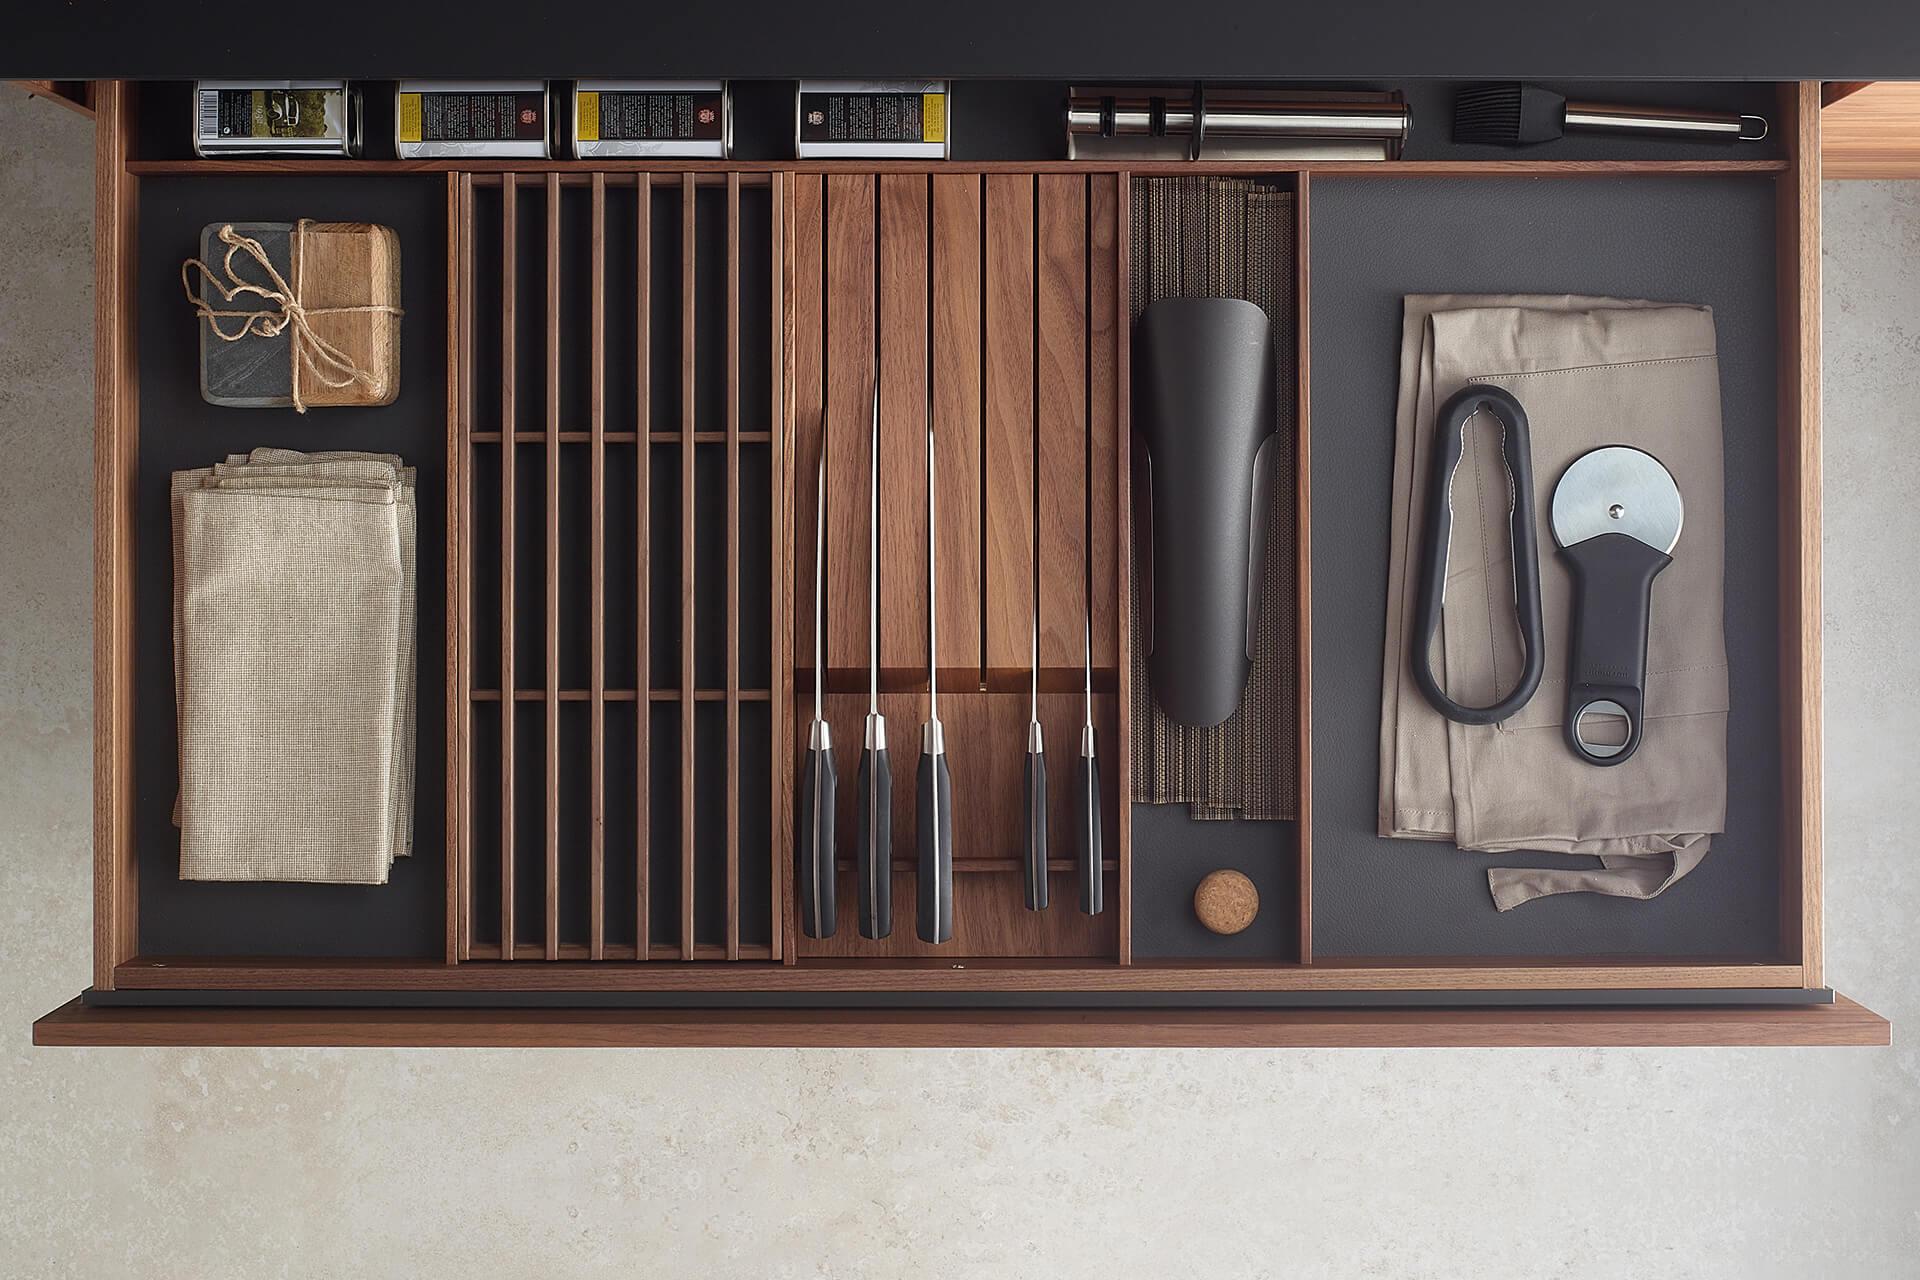 accesorios-madera-cajones-cuchillero-cocina-santos